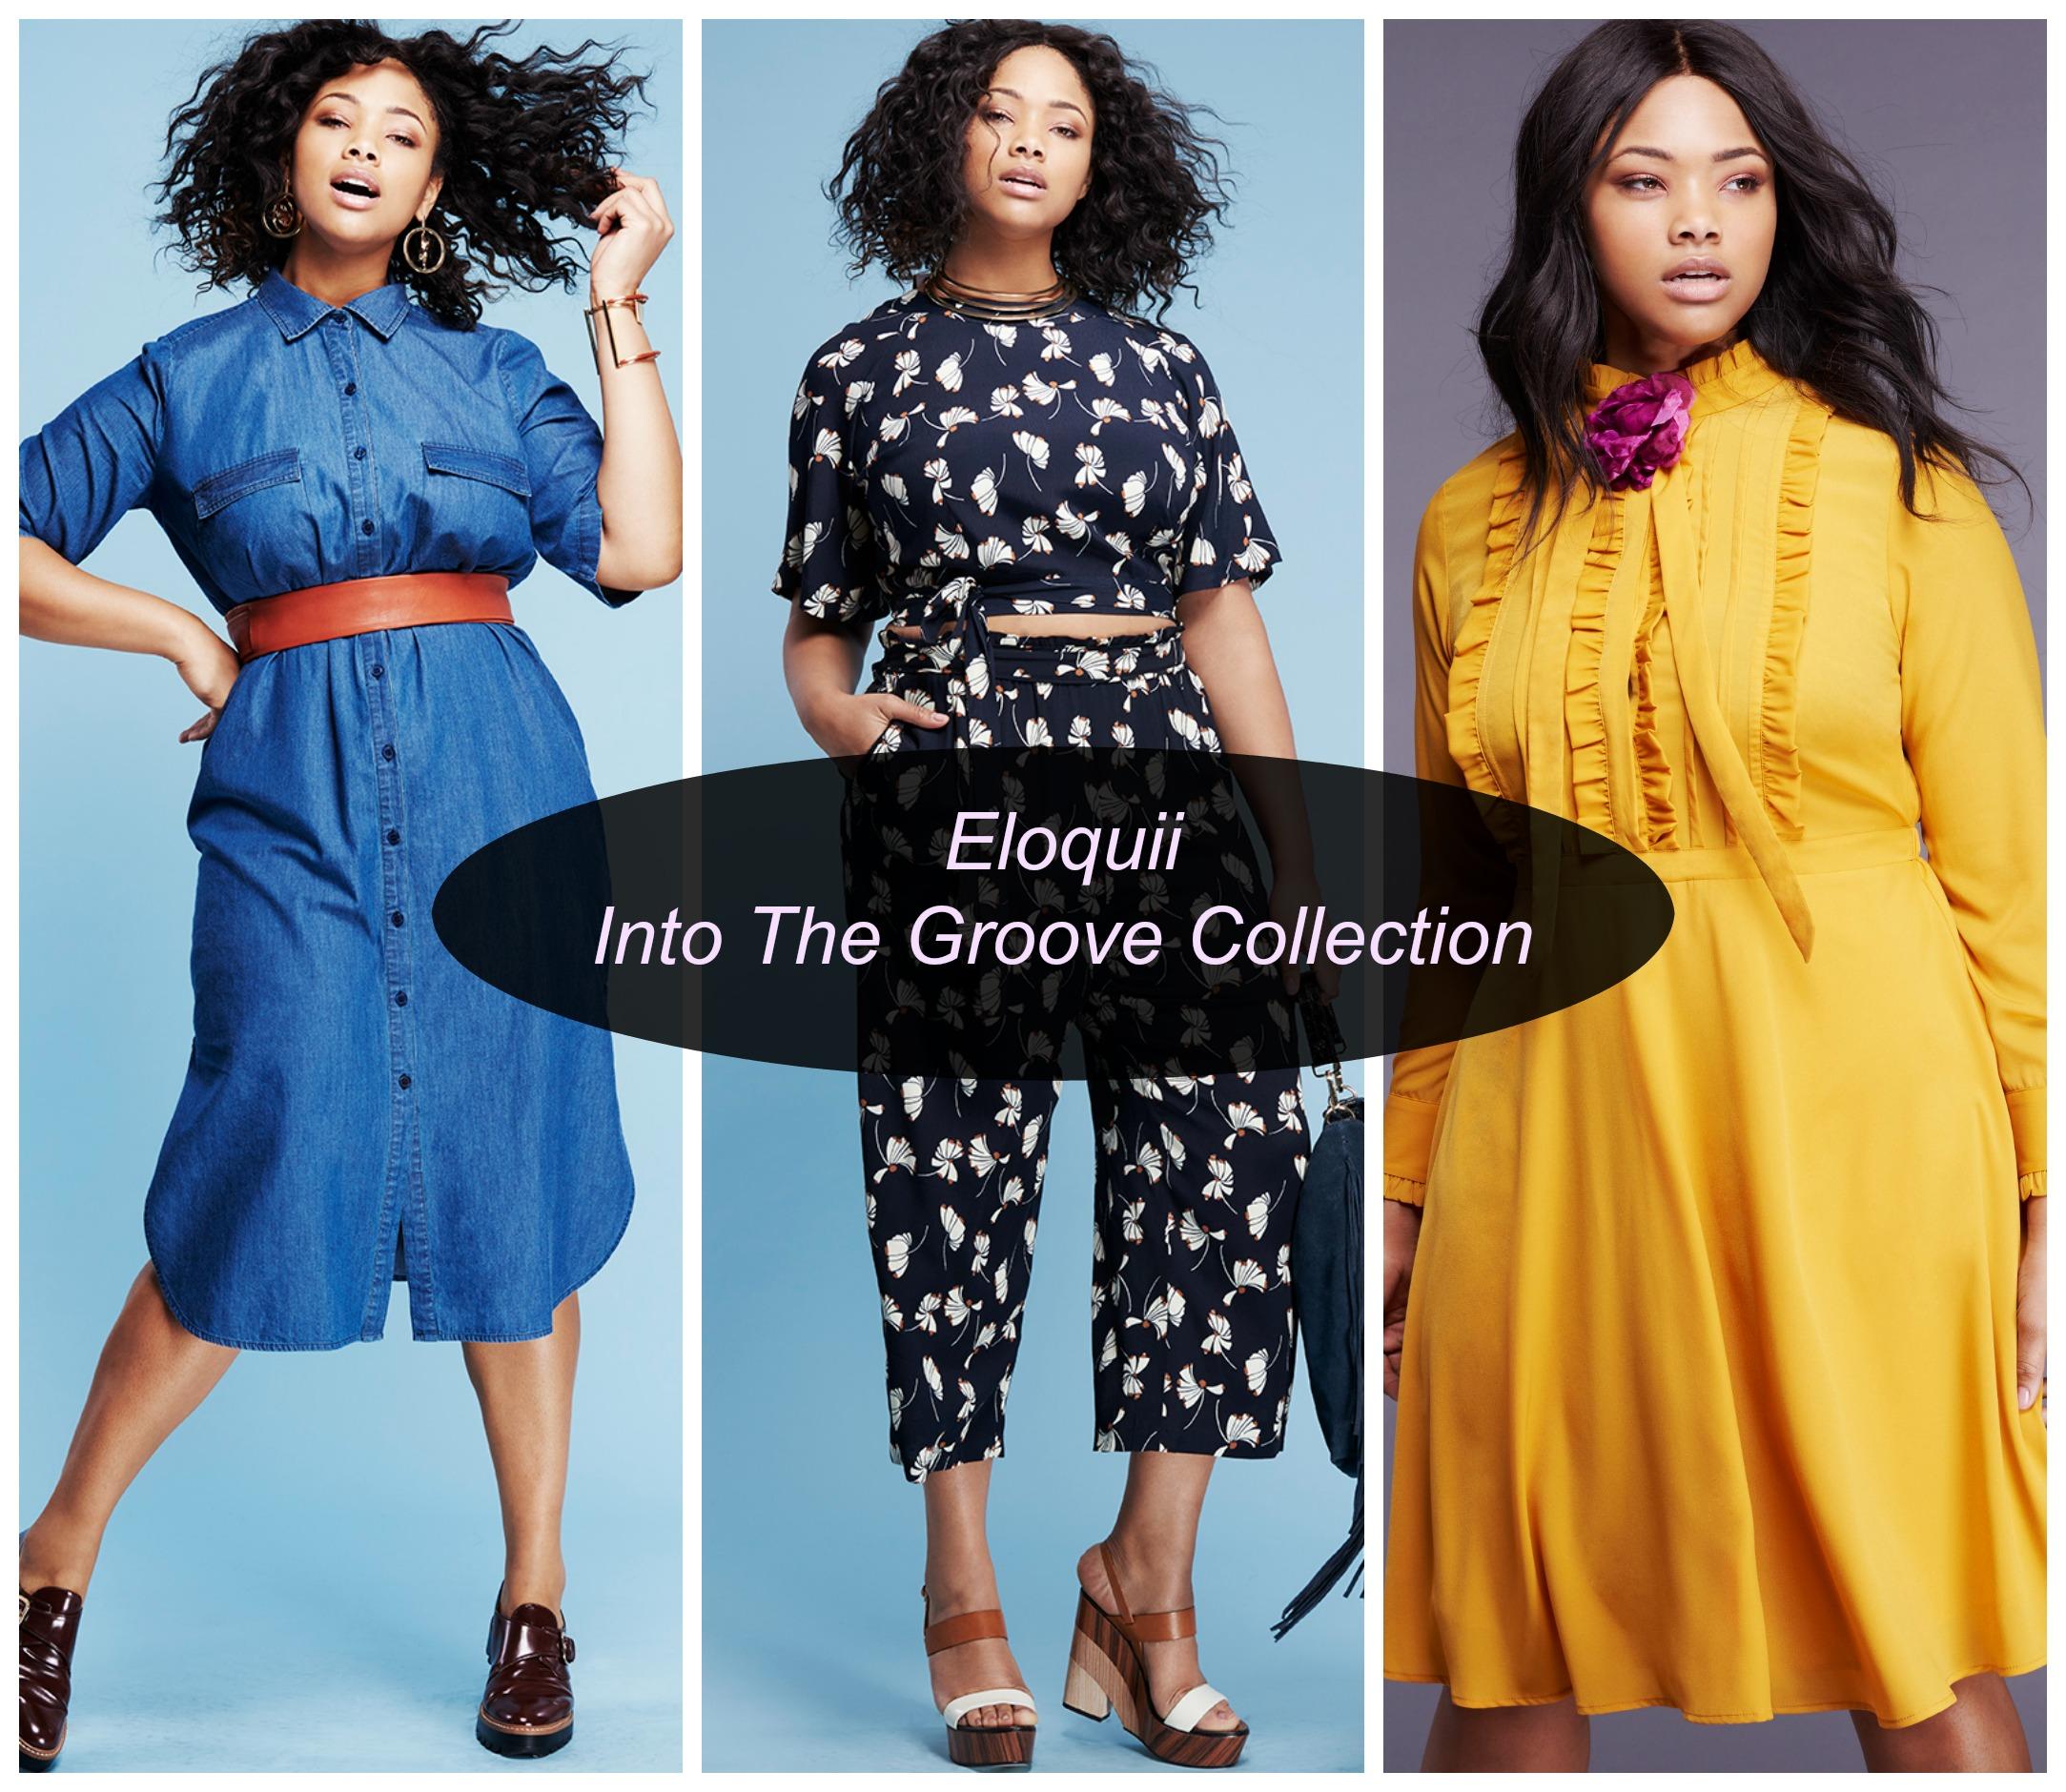 Eloquii Plus Size collection